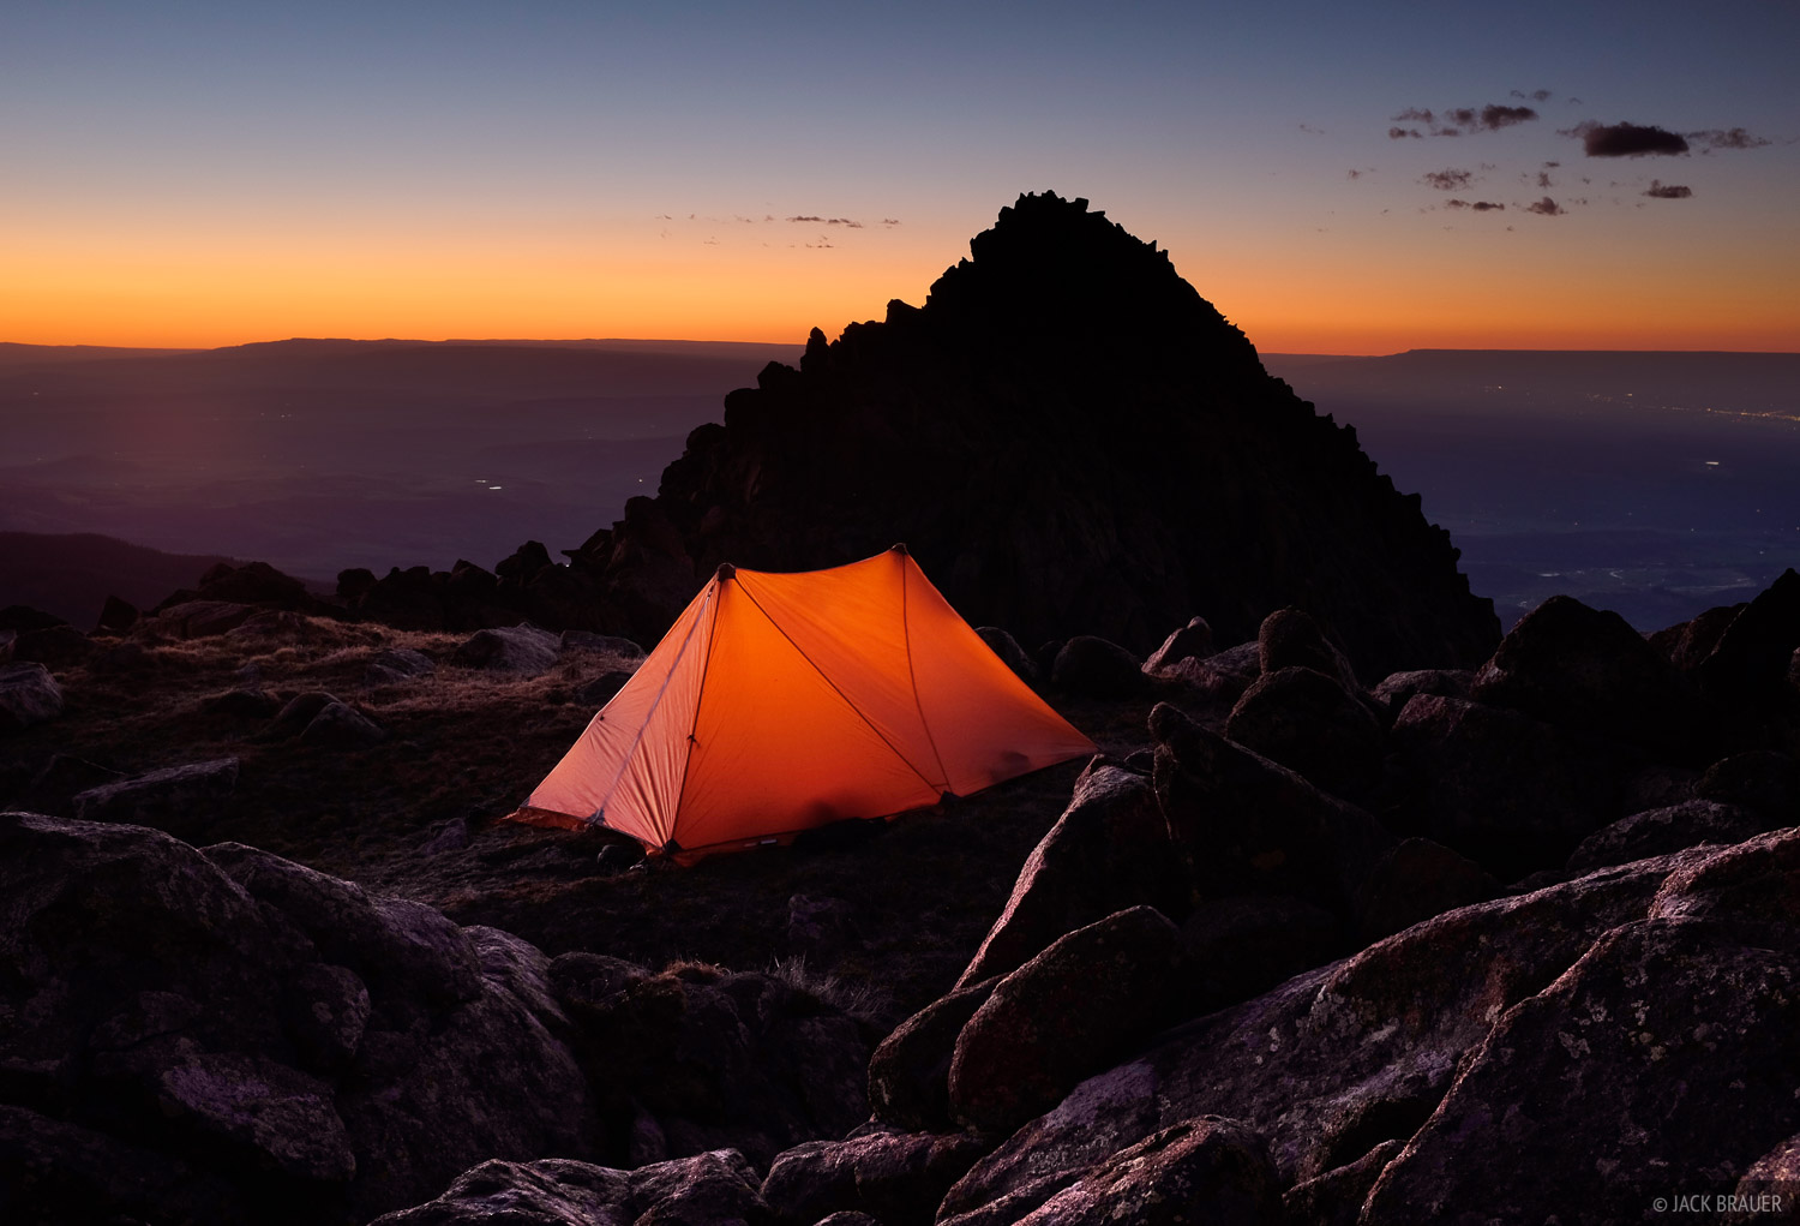 camping, Mt. Sneffels, San Juan Mountains, Colorado, June, photo